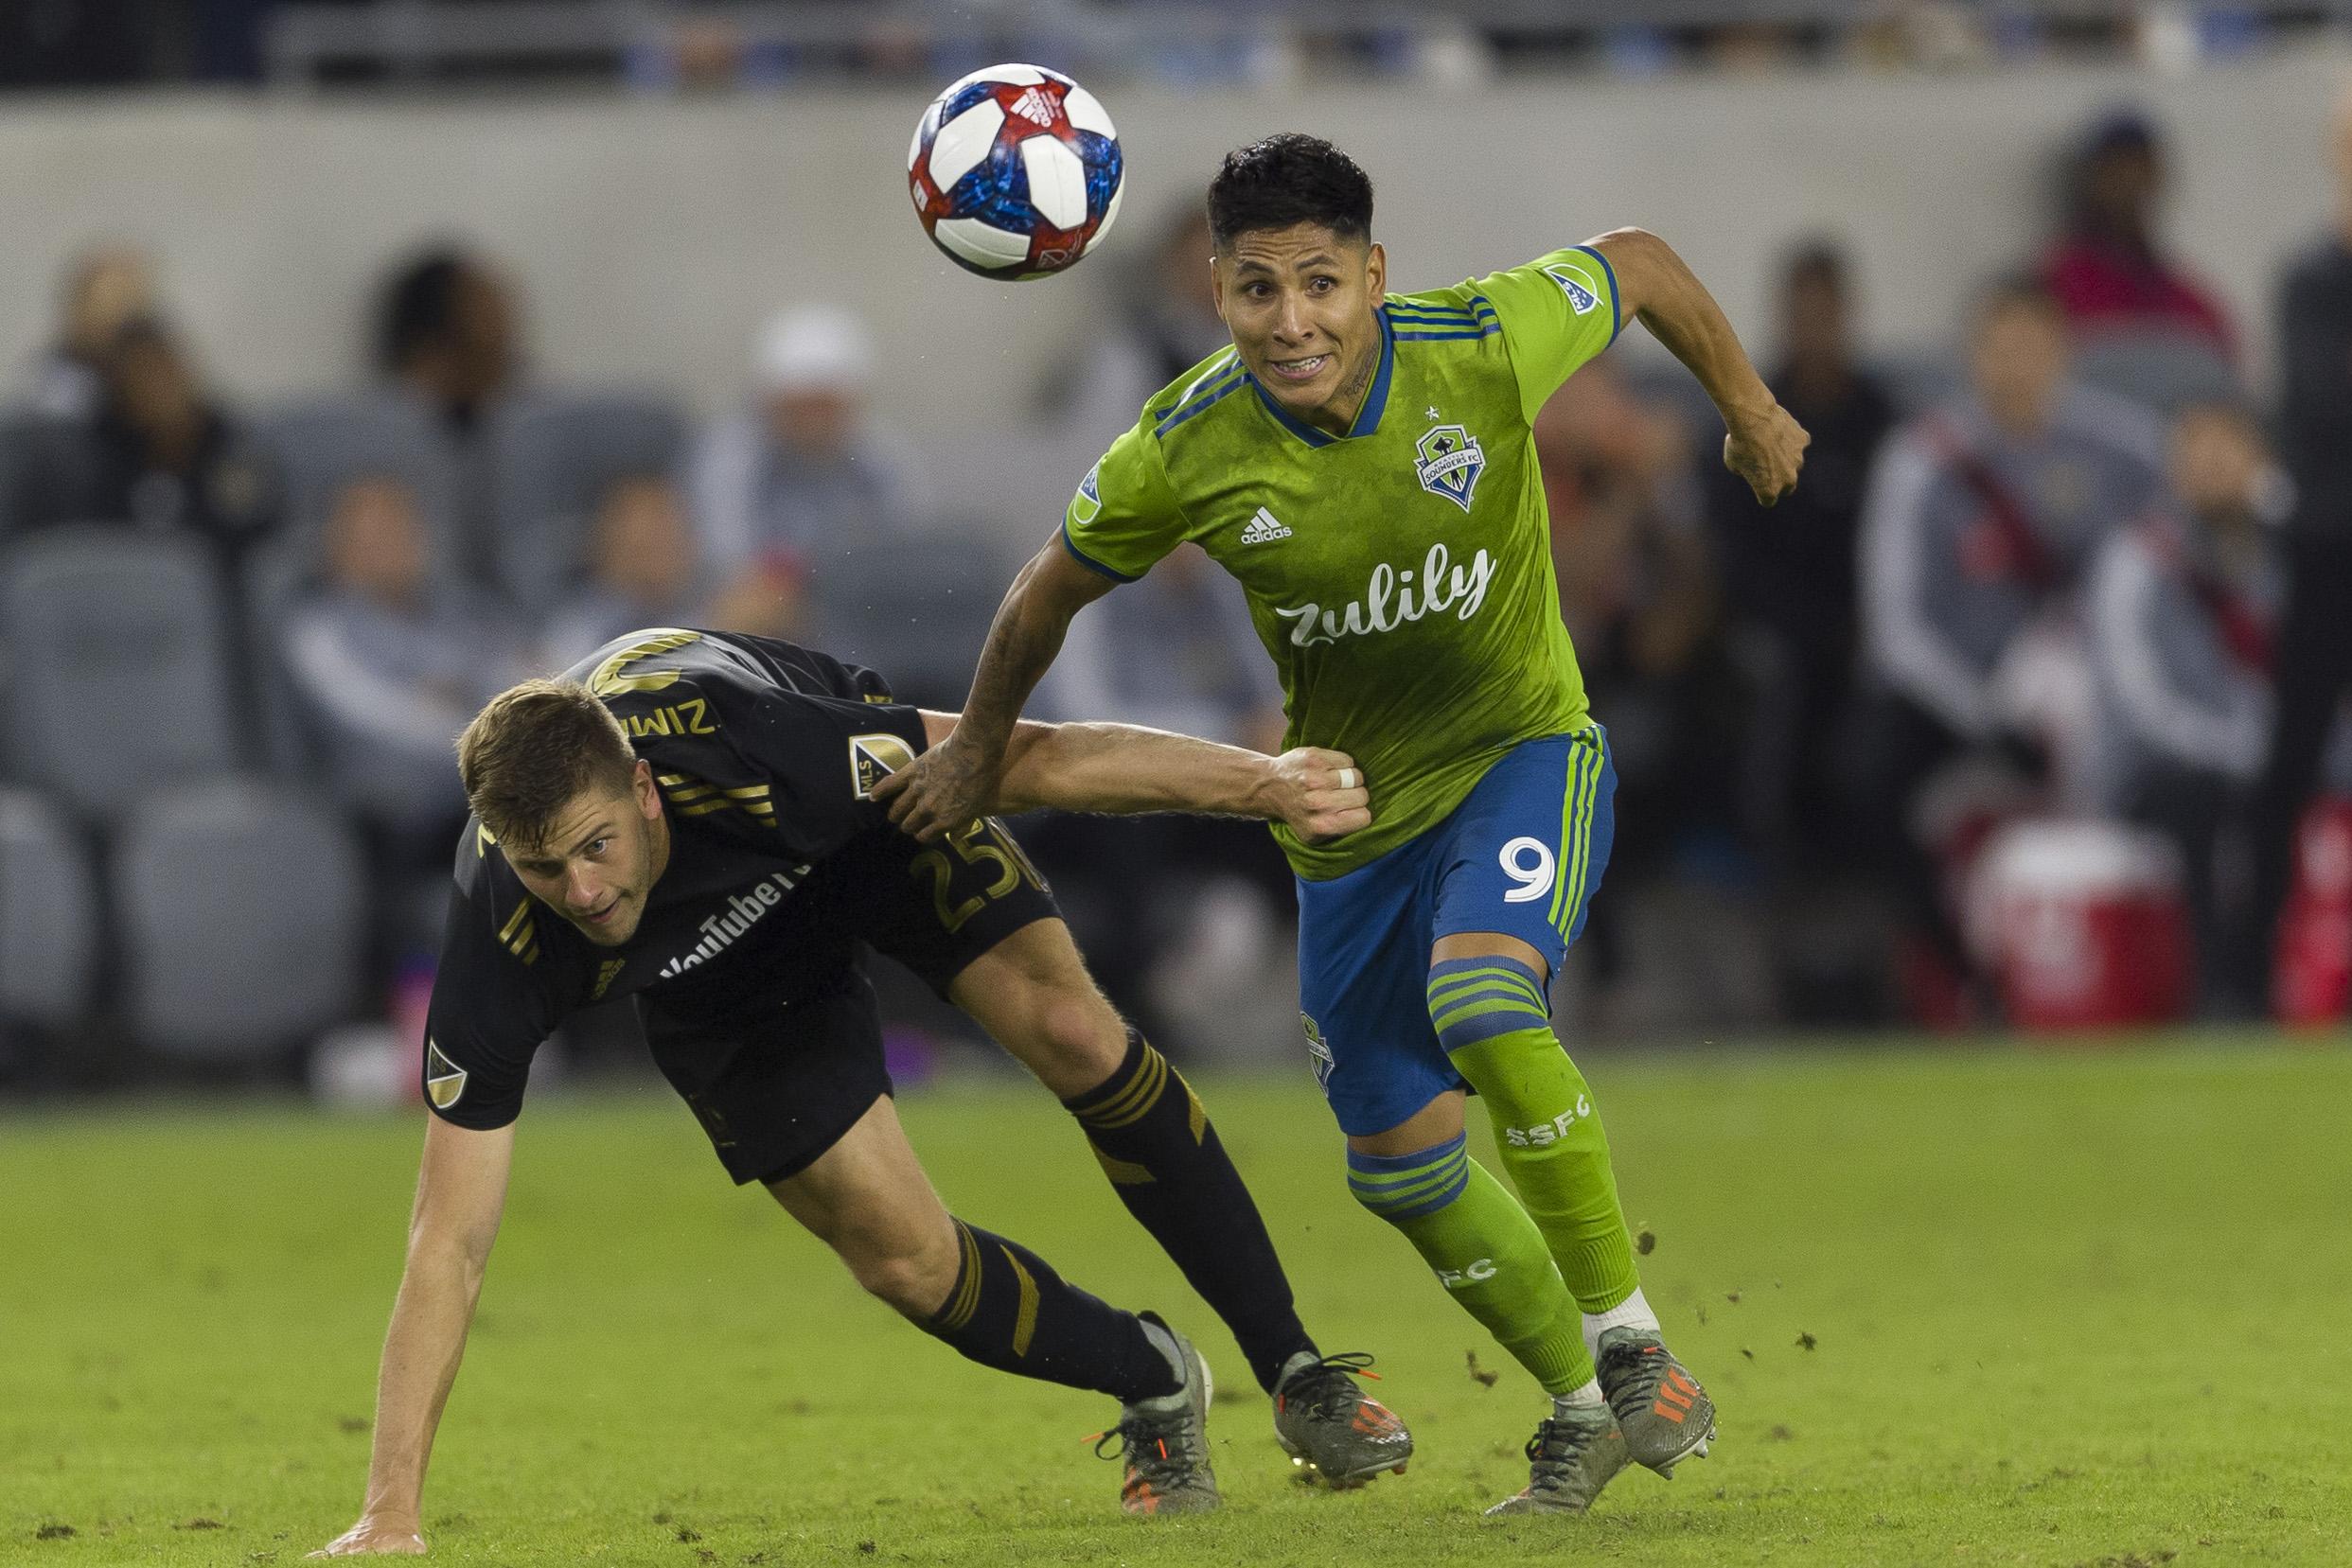 MLS:联盟杯决赛中,西雅图海湾FC在洛杉矶FC